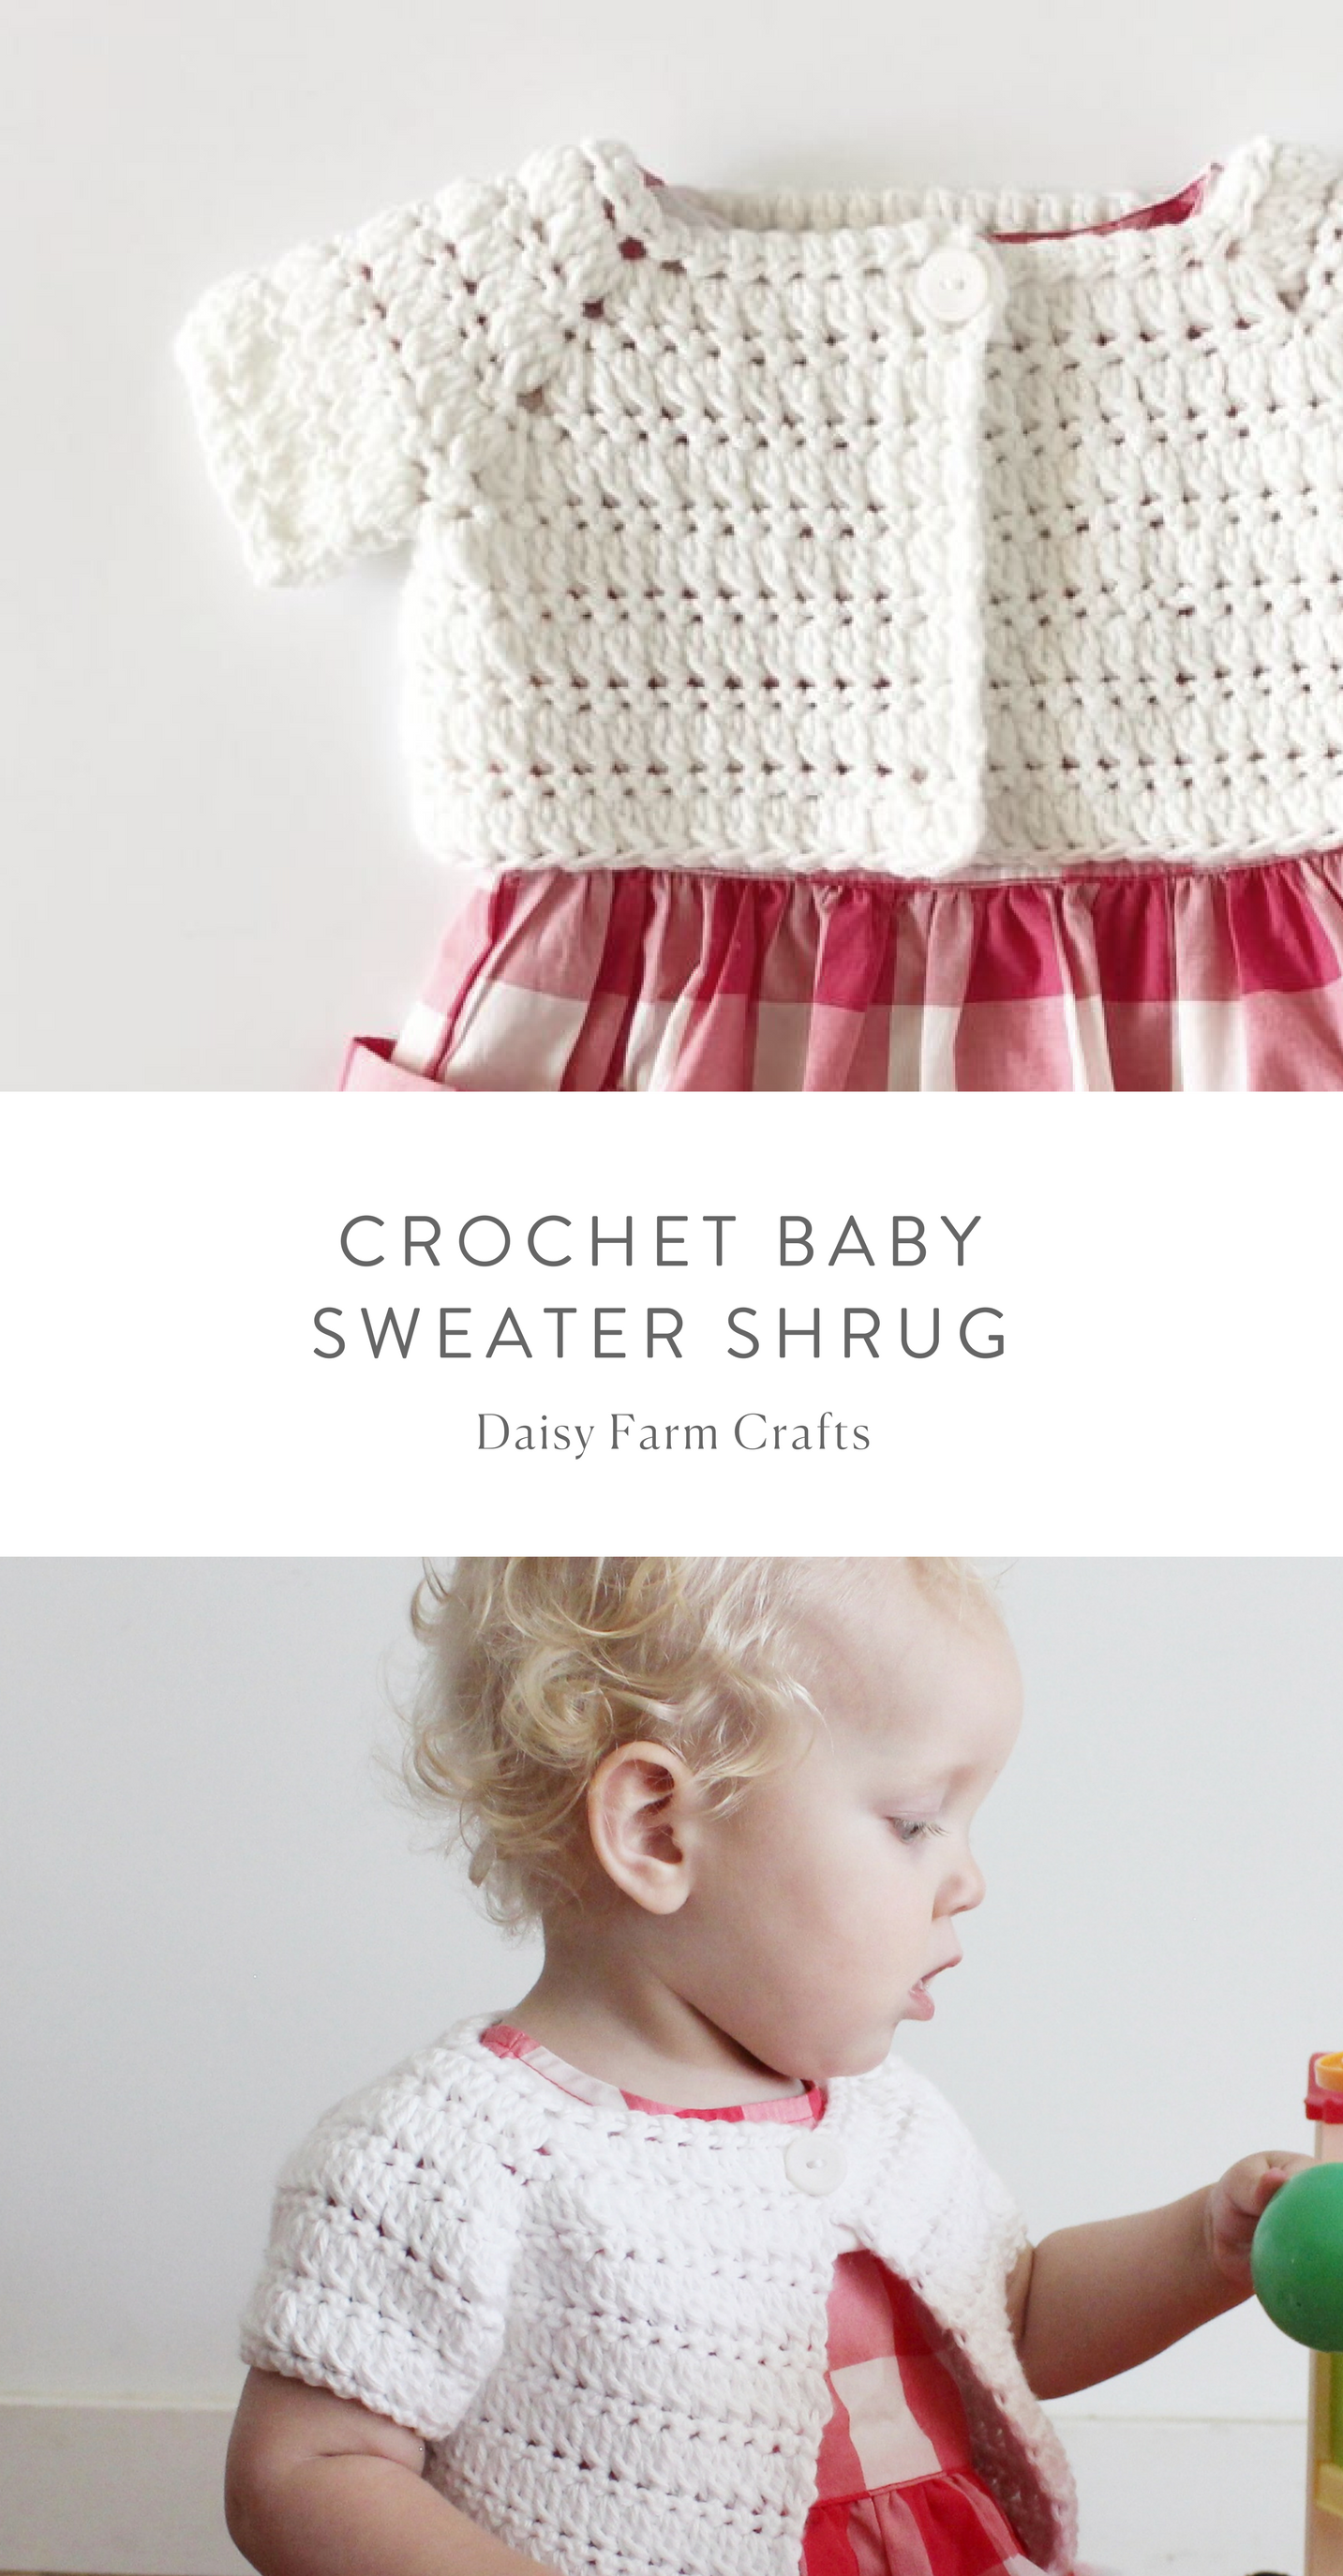 d58a967f3 Crochet Baby Sweater Shrug